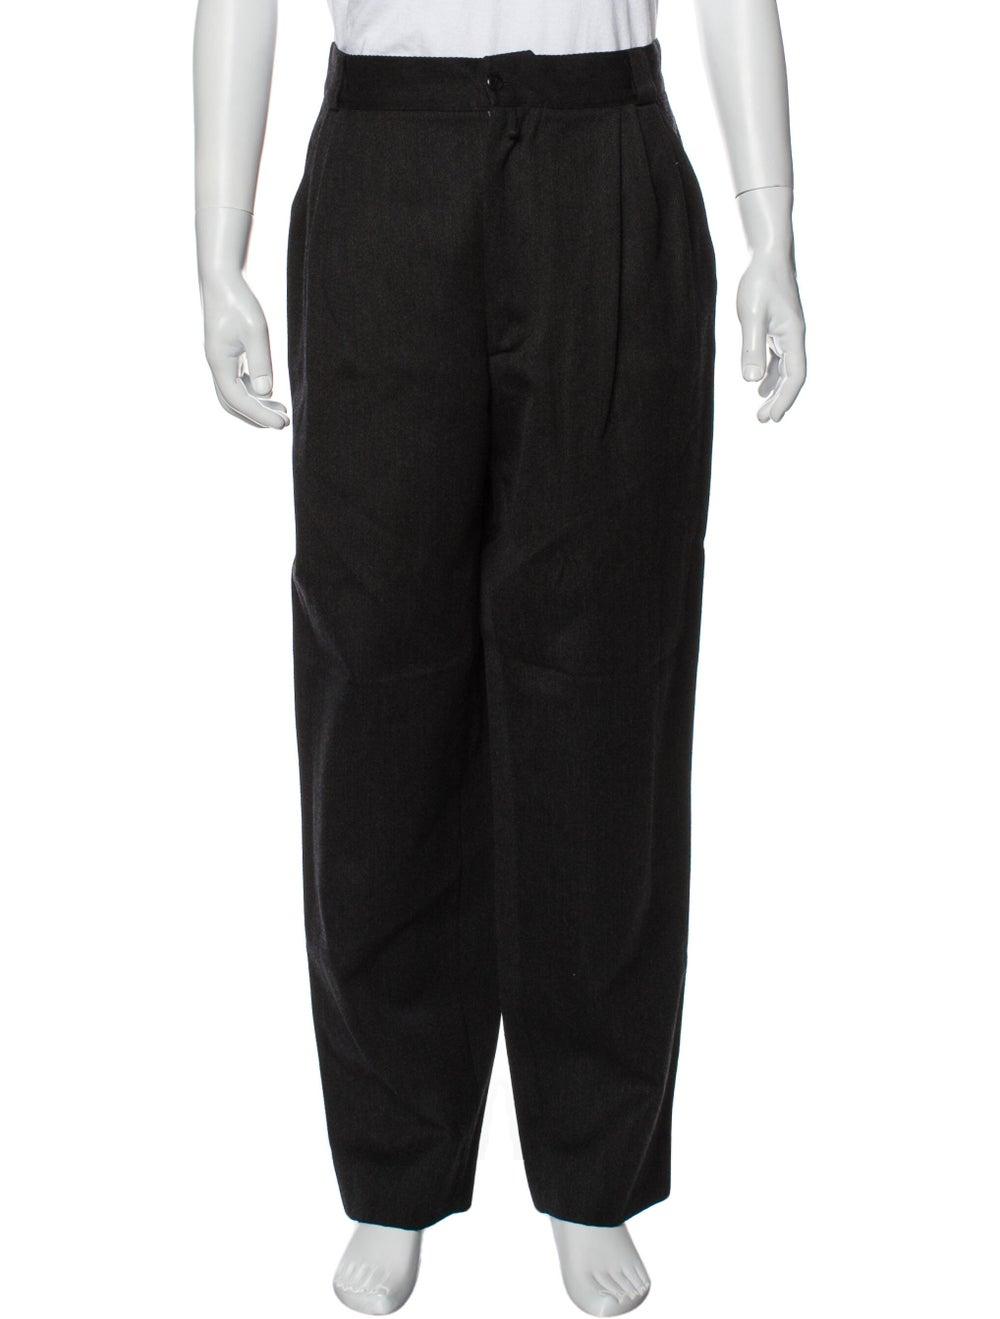 Gianni Versace Vintage Pants Wool - image 1